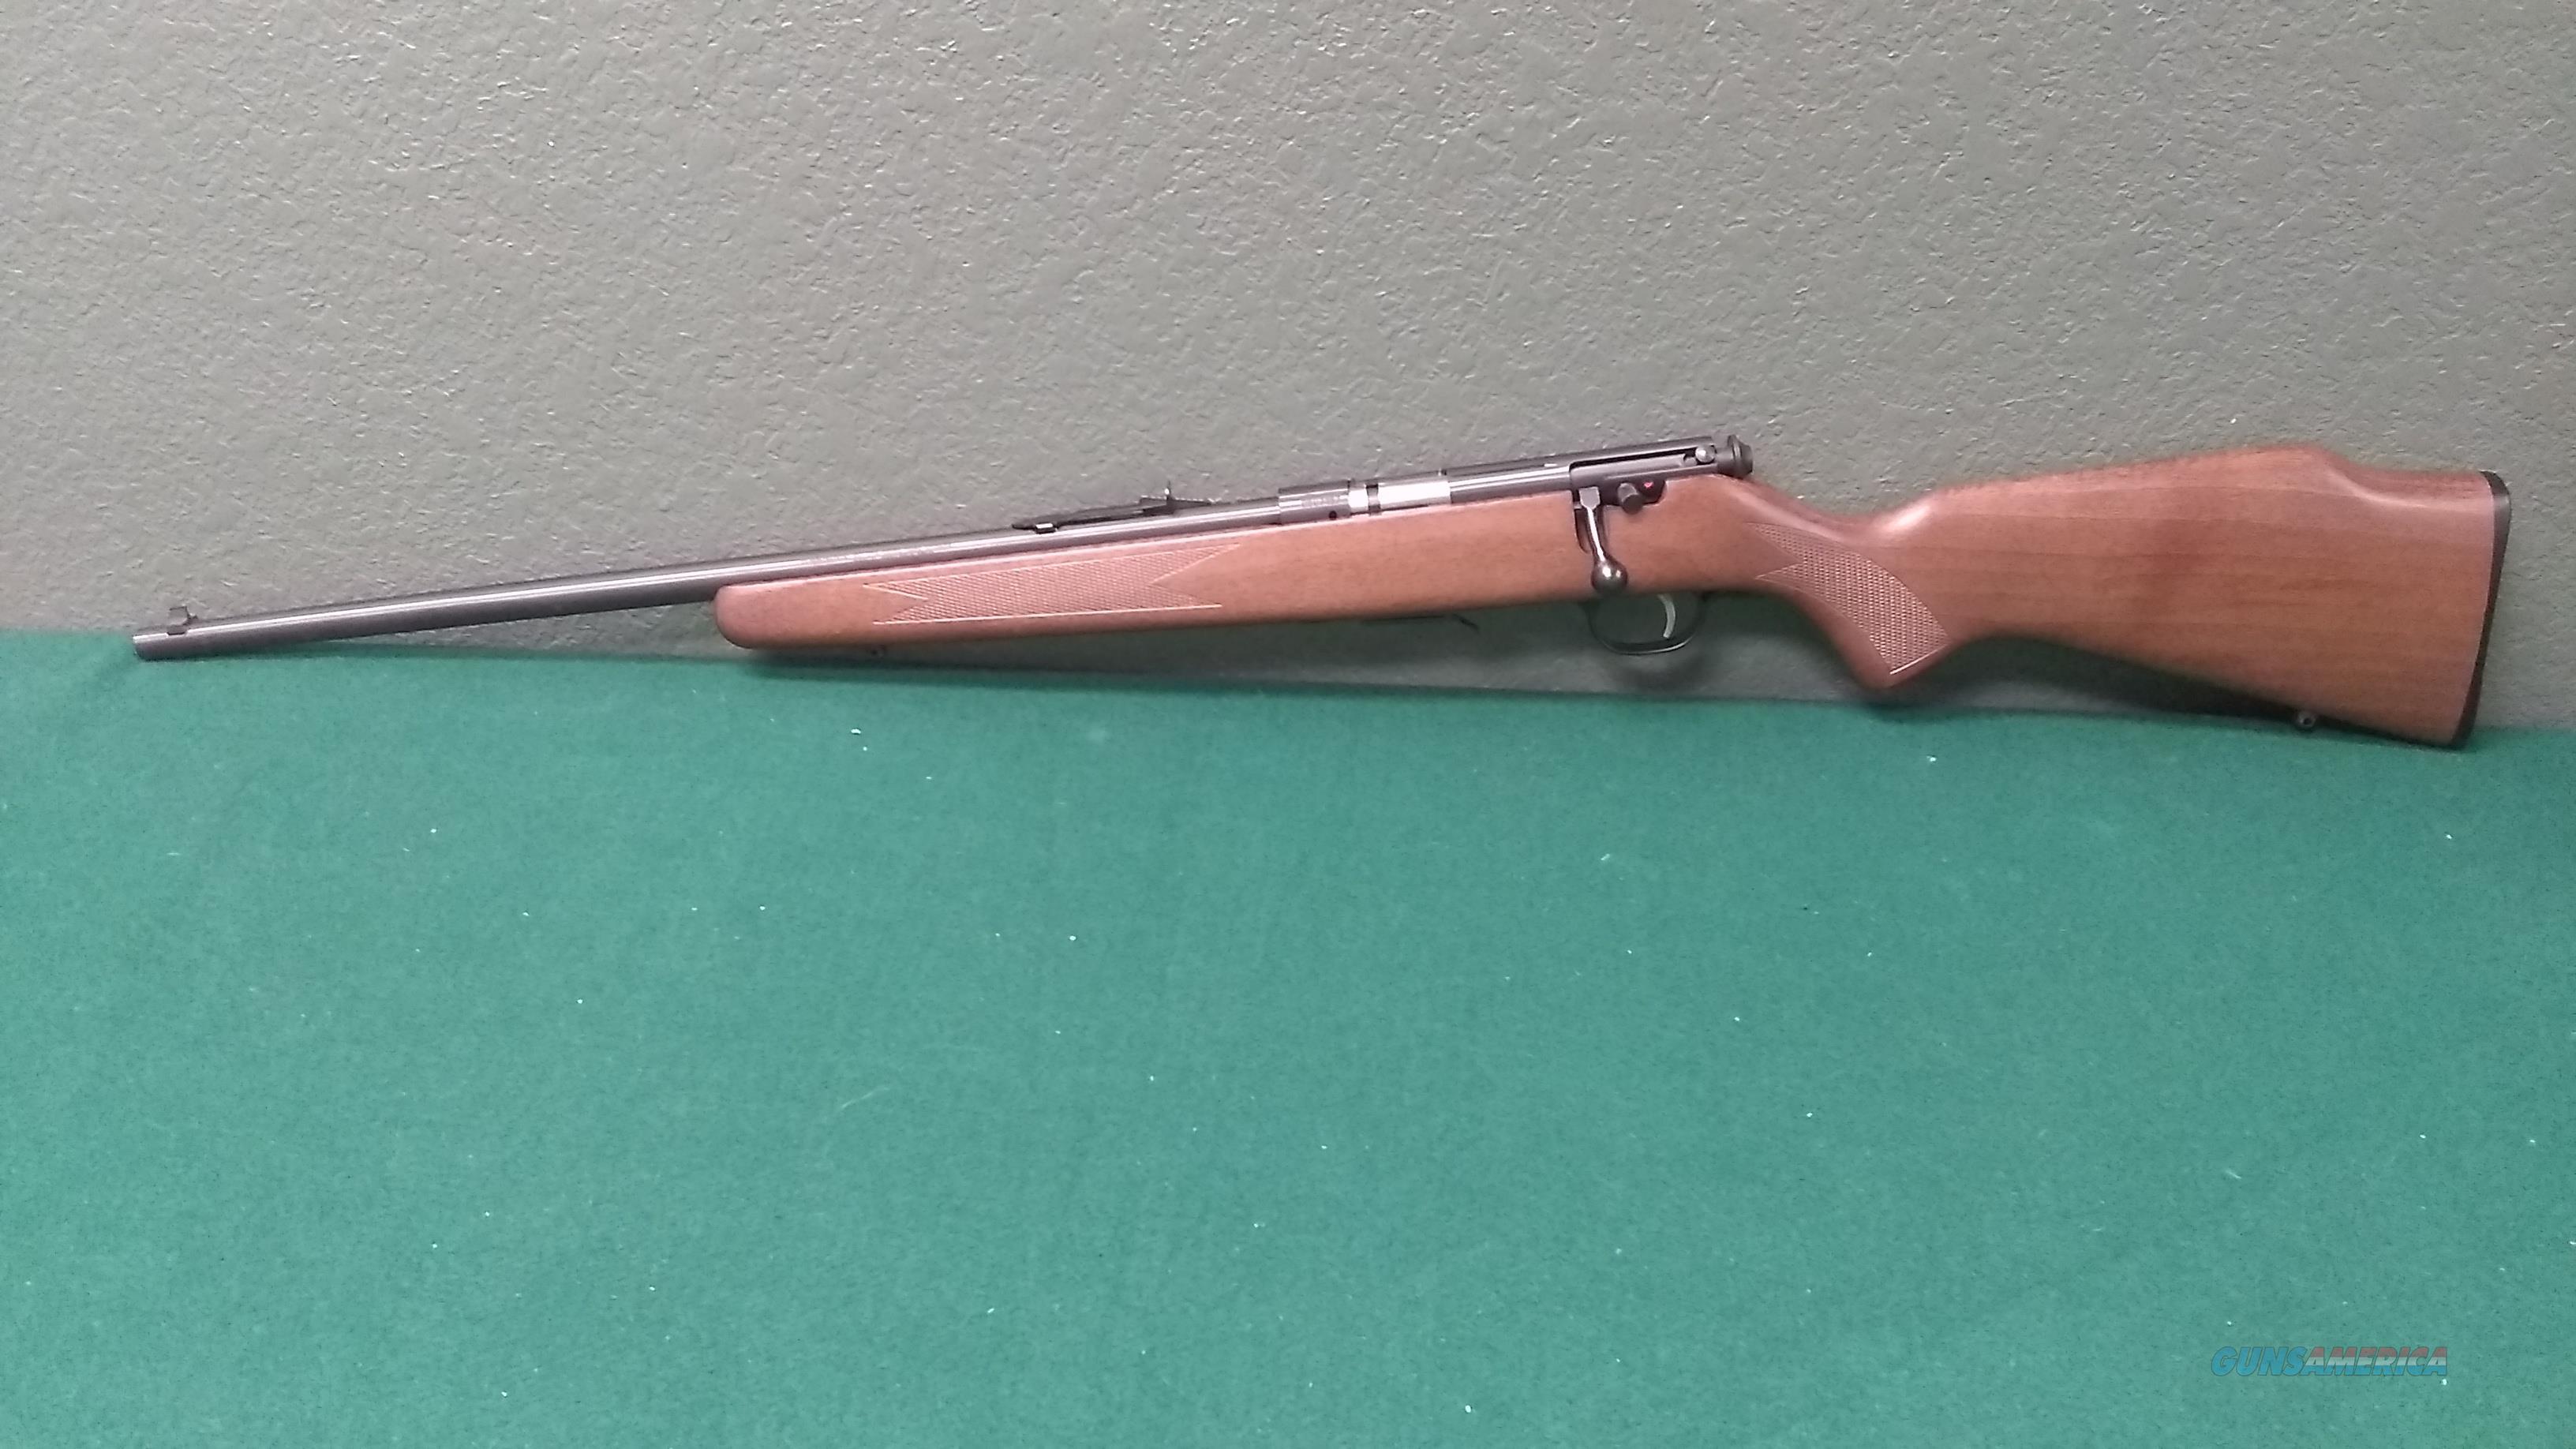 "Savage 93 - 22WMR - Left Handed - 20"" Barrel - Excellent condition  Guns > Rifles > Savage Rifles > Rimfire"